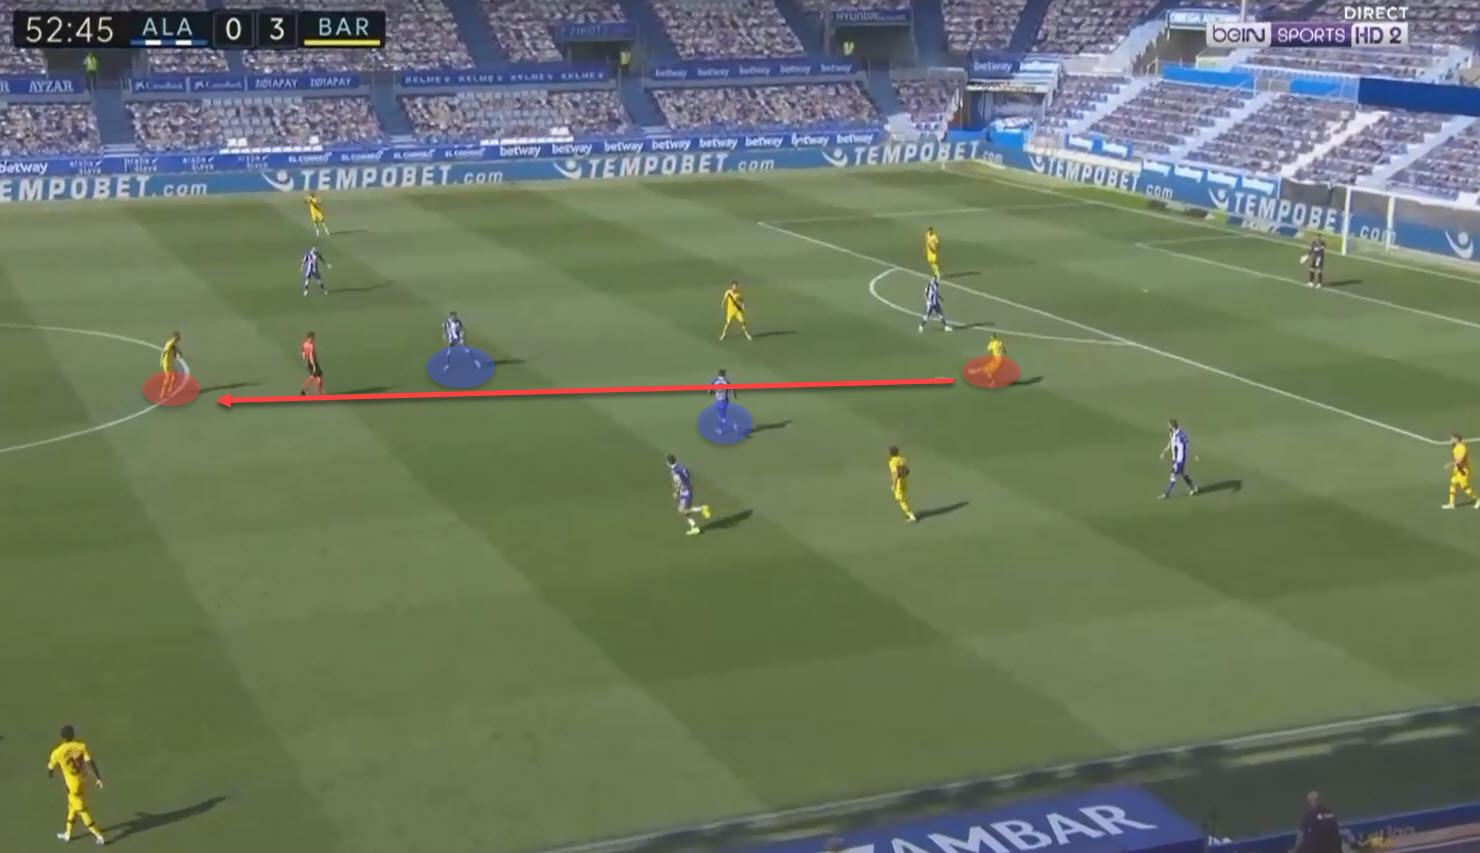 La Liga 2019/20: Deportivo Alaves vs Barcelona - tactical analysis tactics